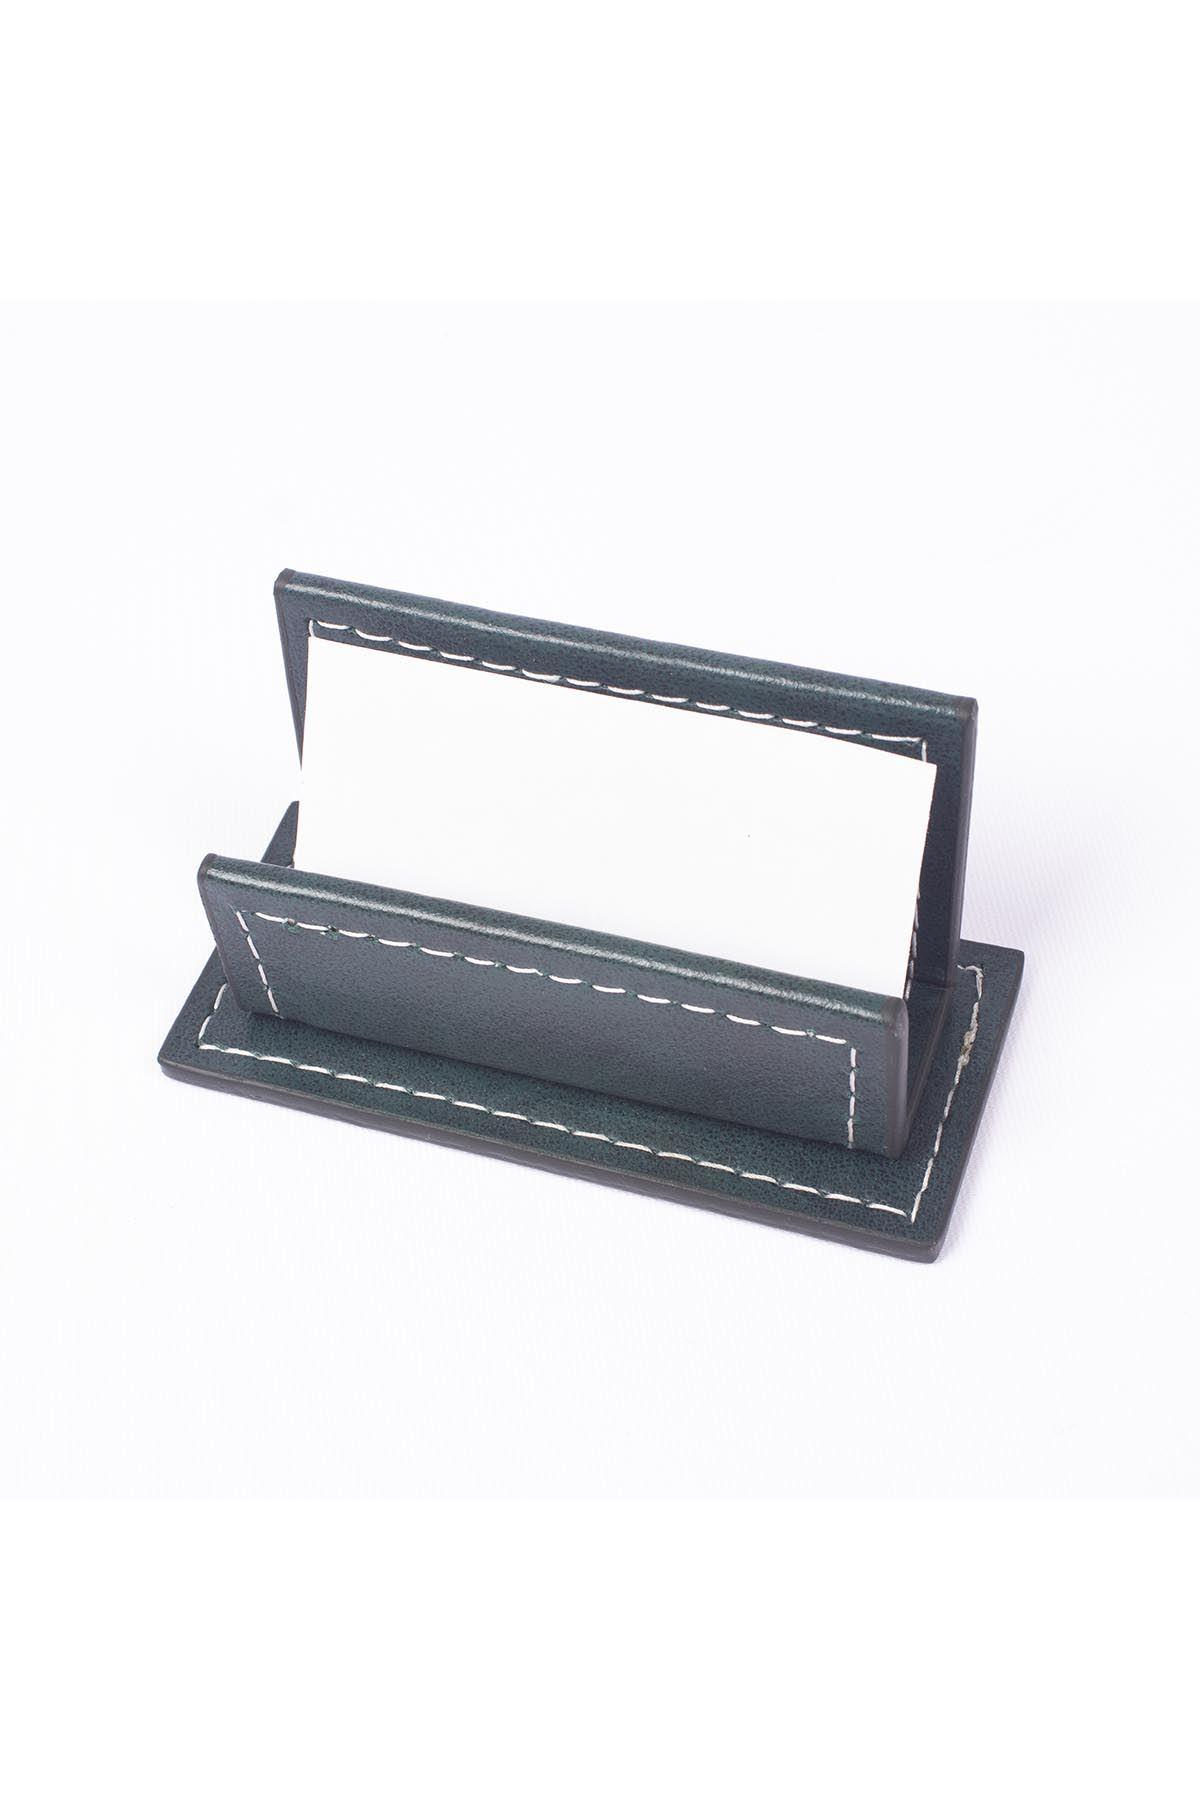 Vega Leather Desk Set Green 4 Accessories